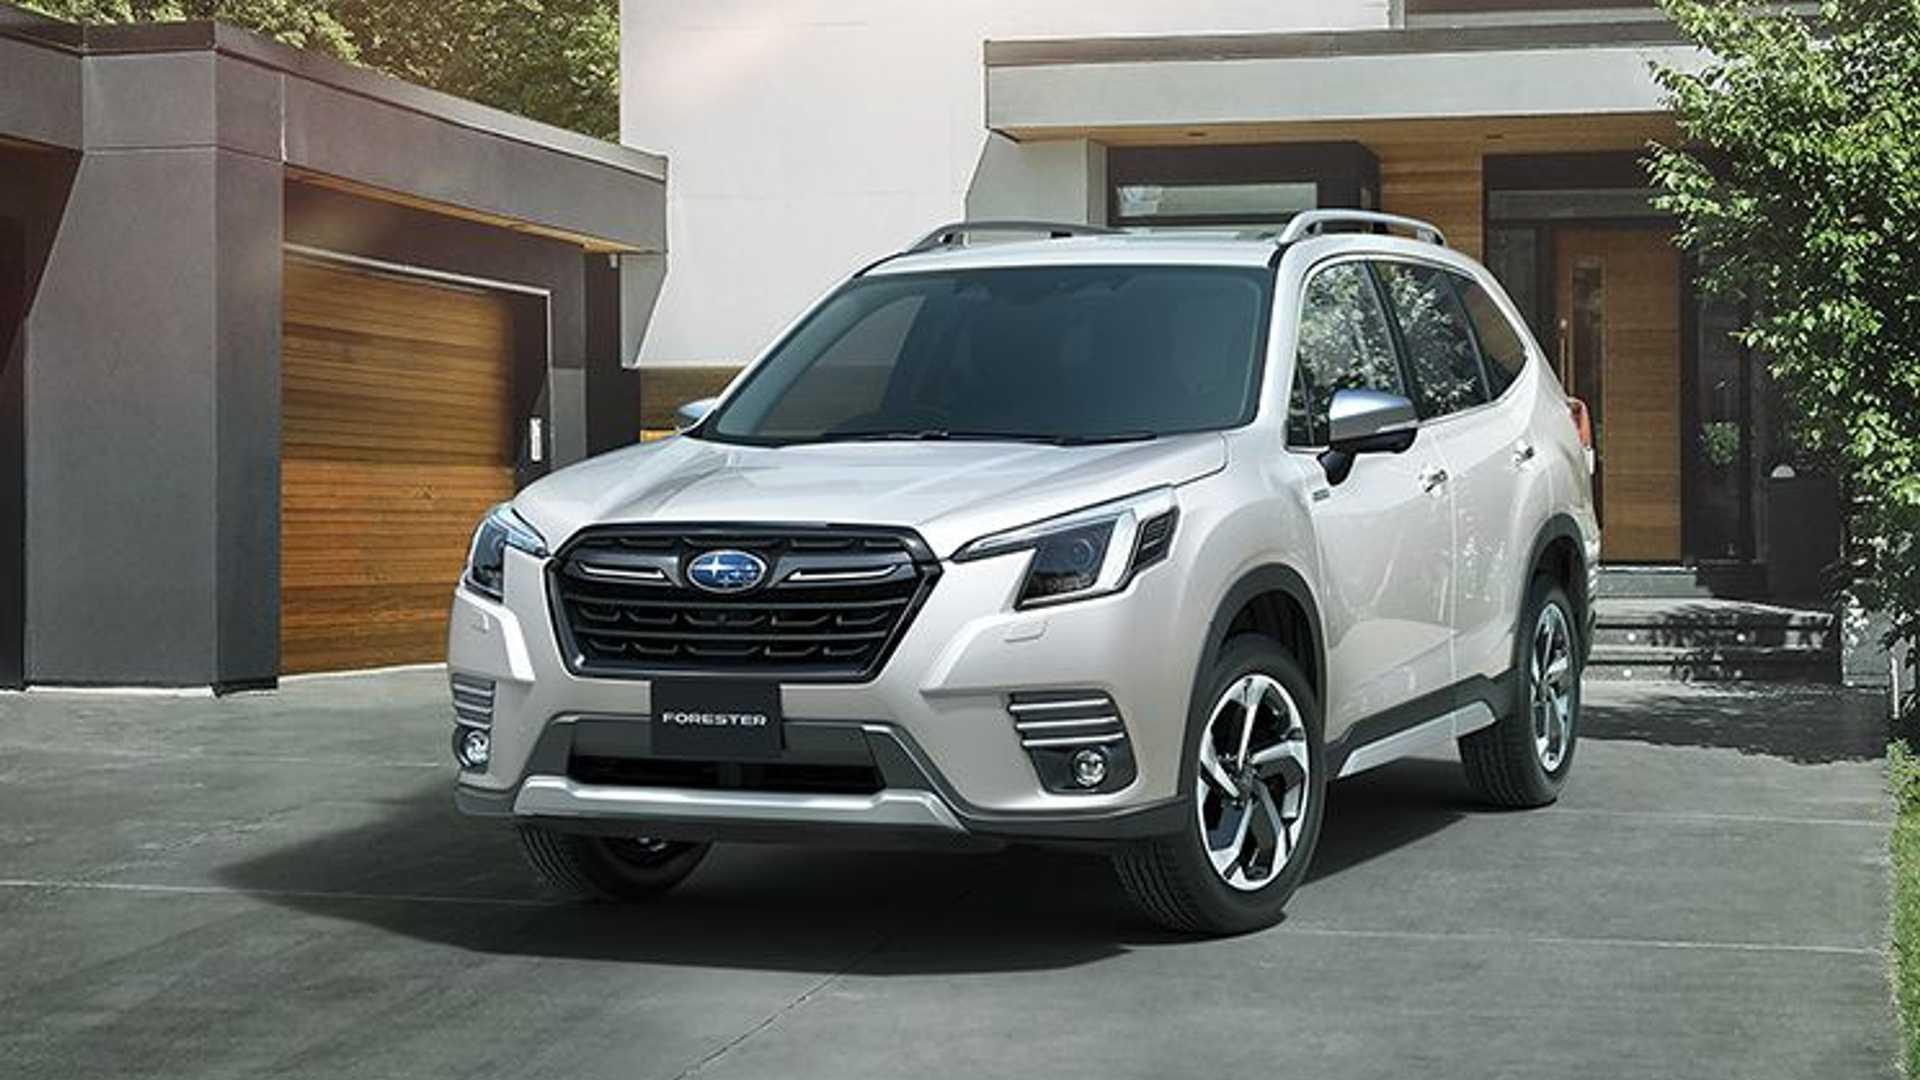 Subaru-Forester-facelift-2